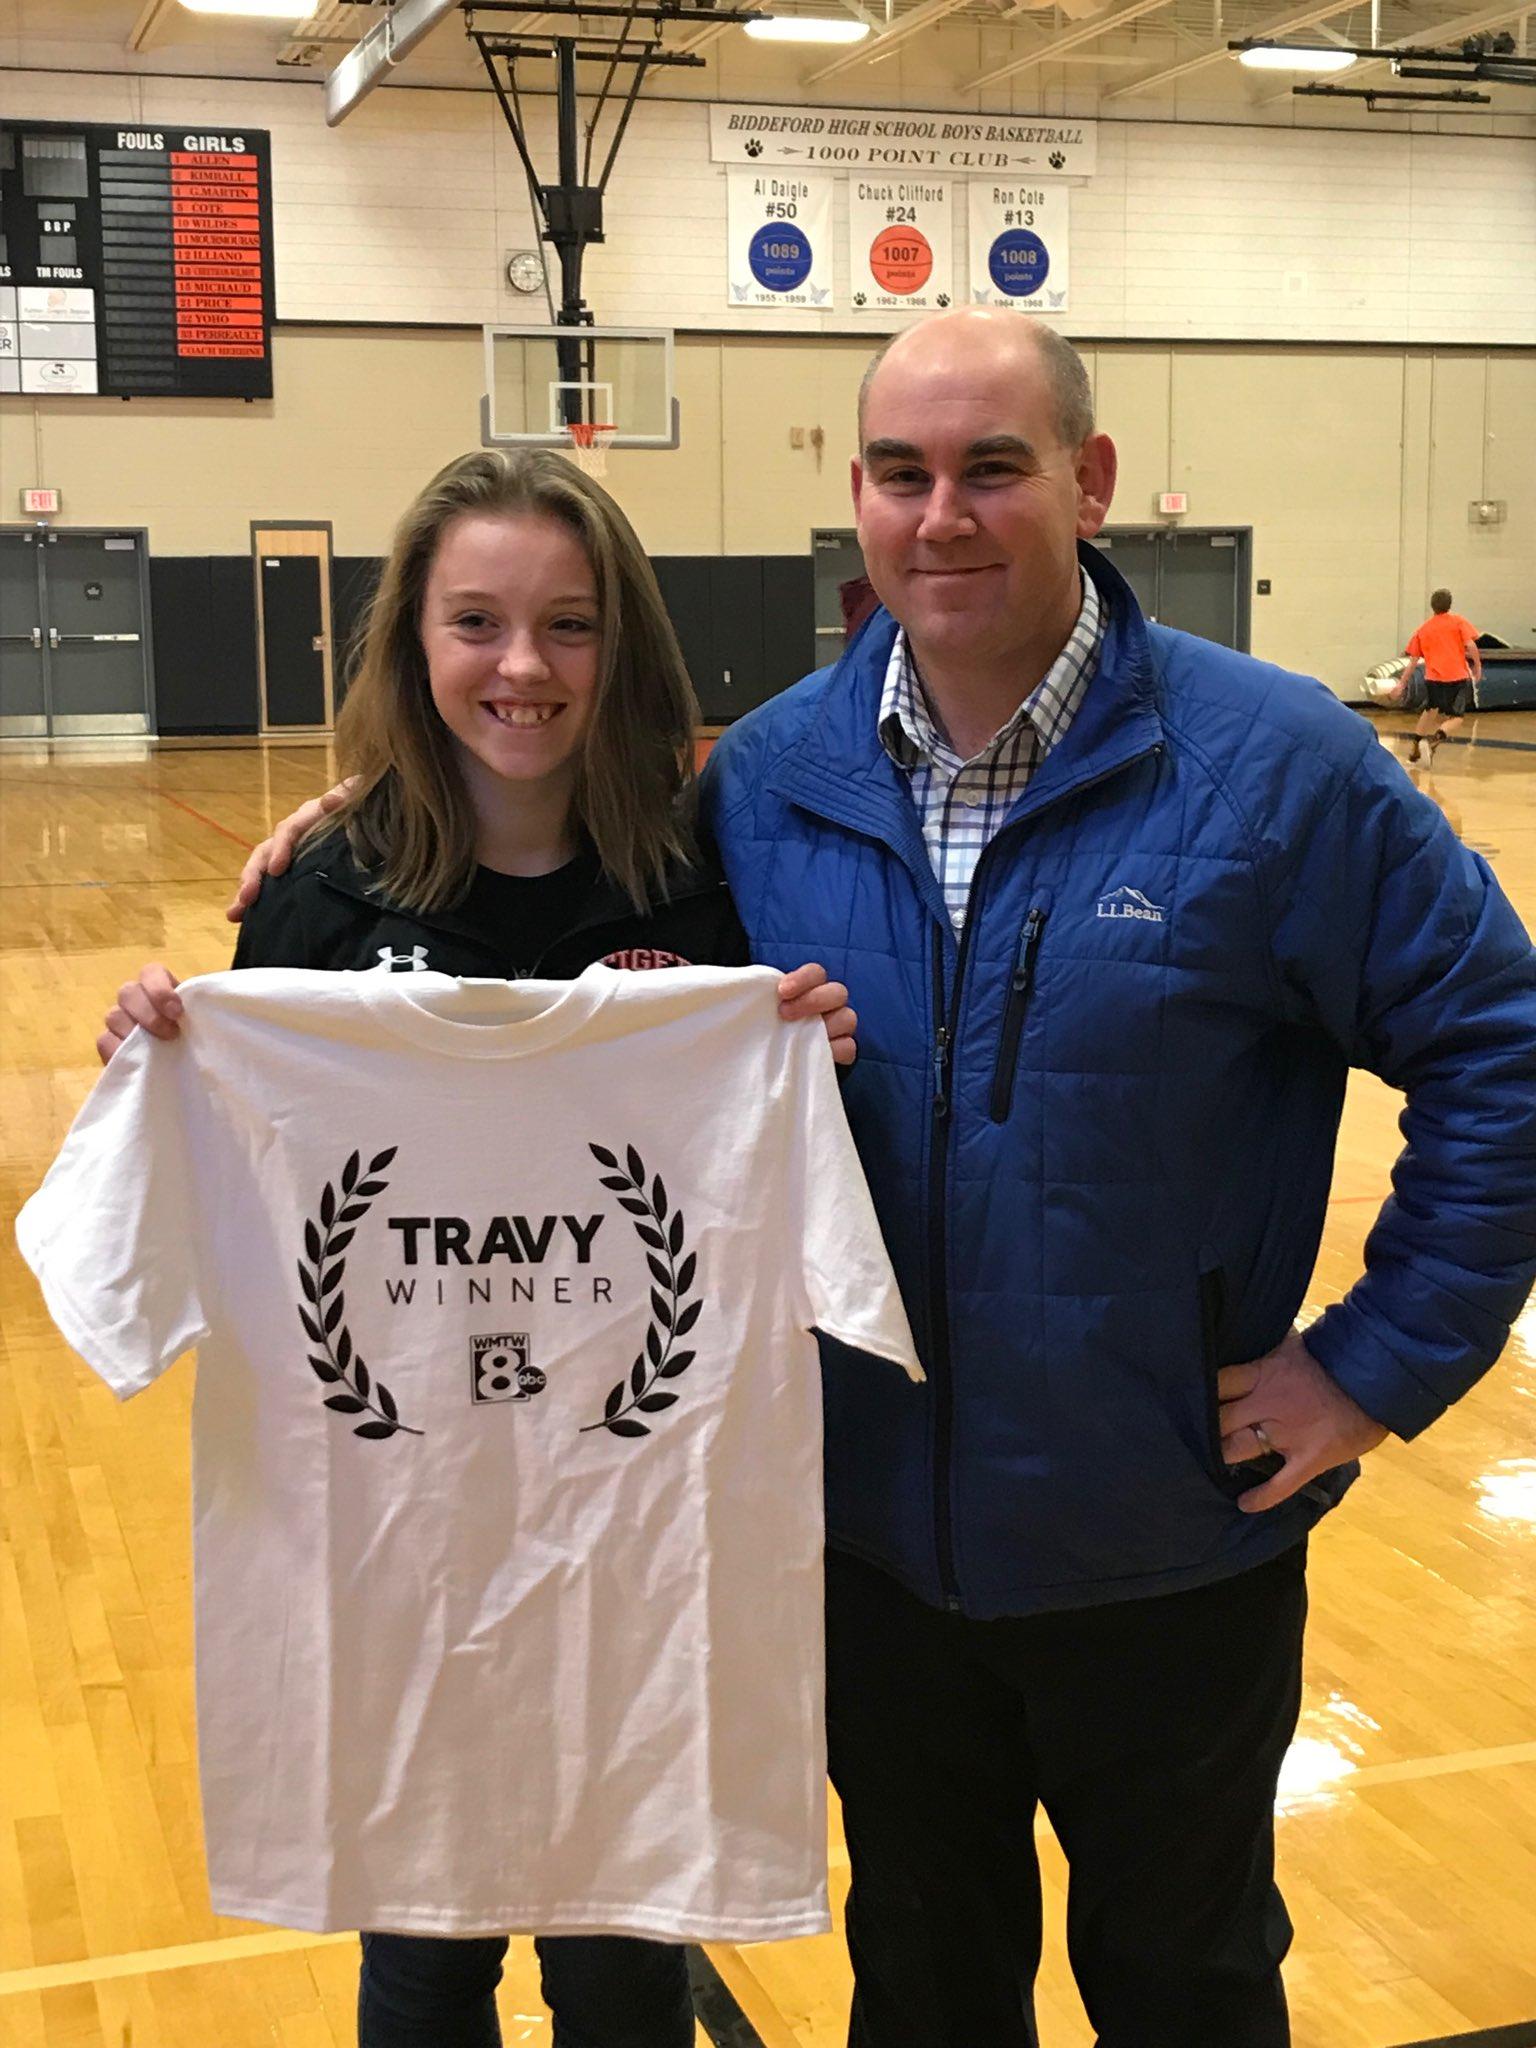 Jeremie R Sirois On Twitter Abby Receiving Her Travy Award W Tlee Wmtw